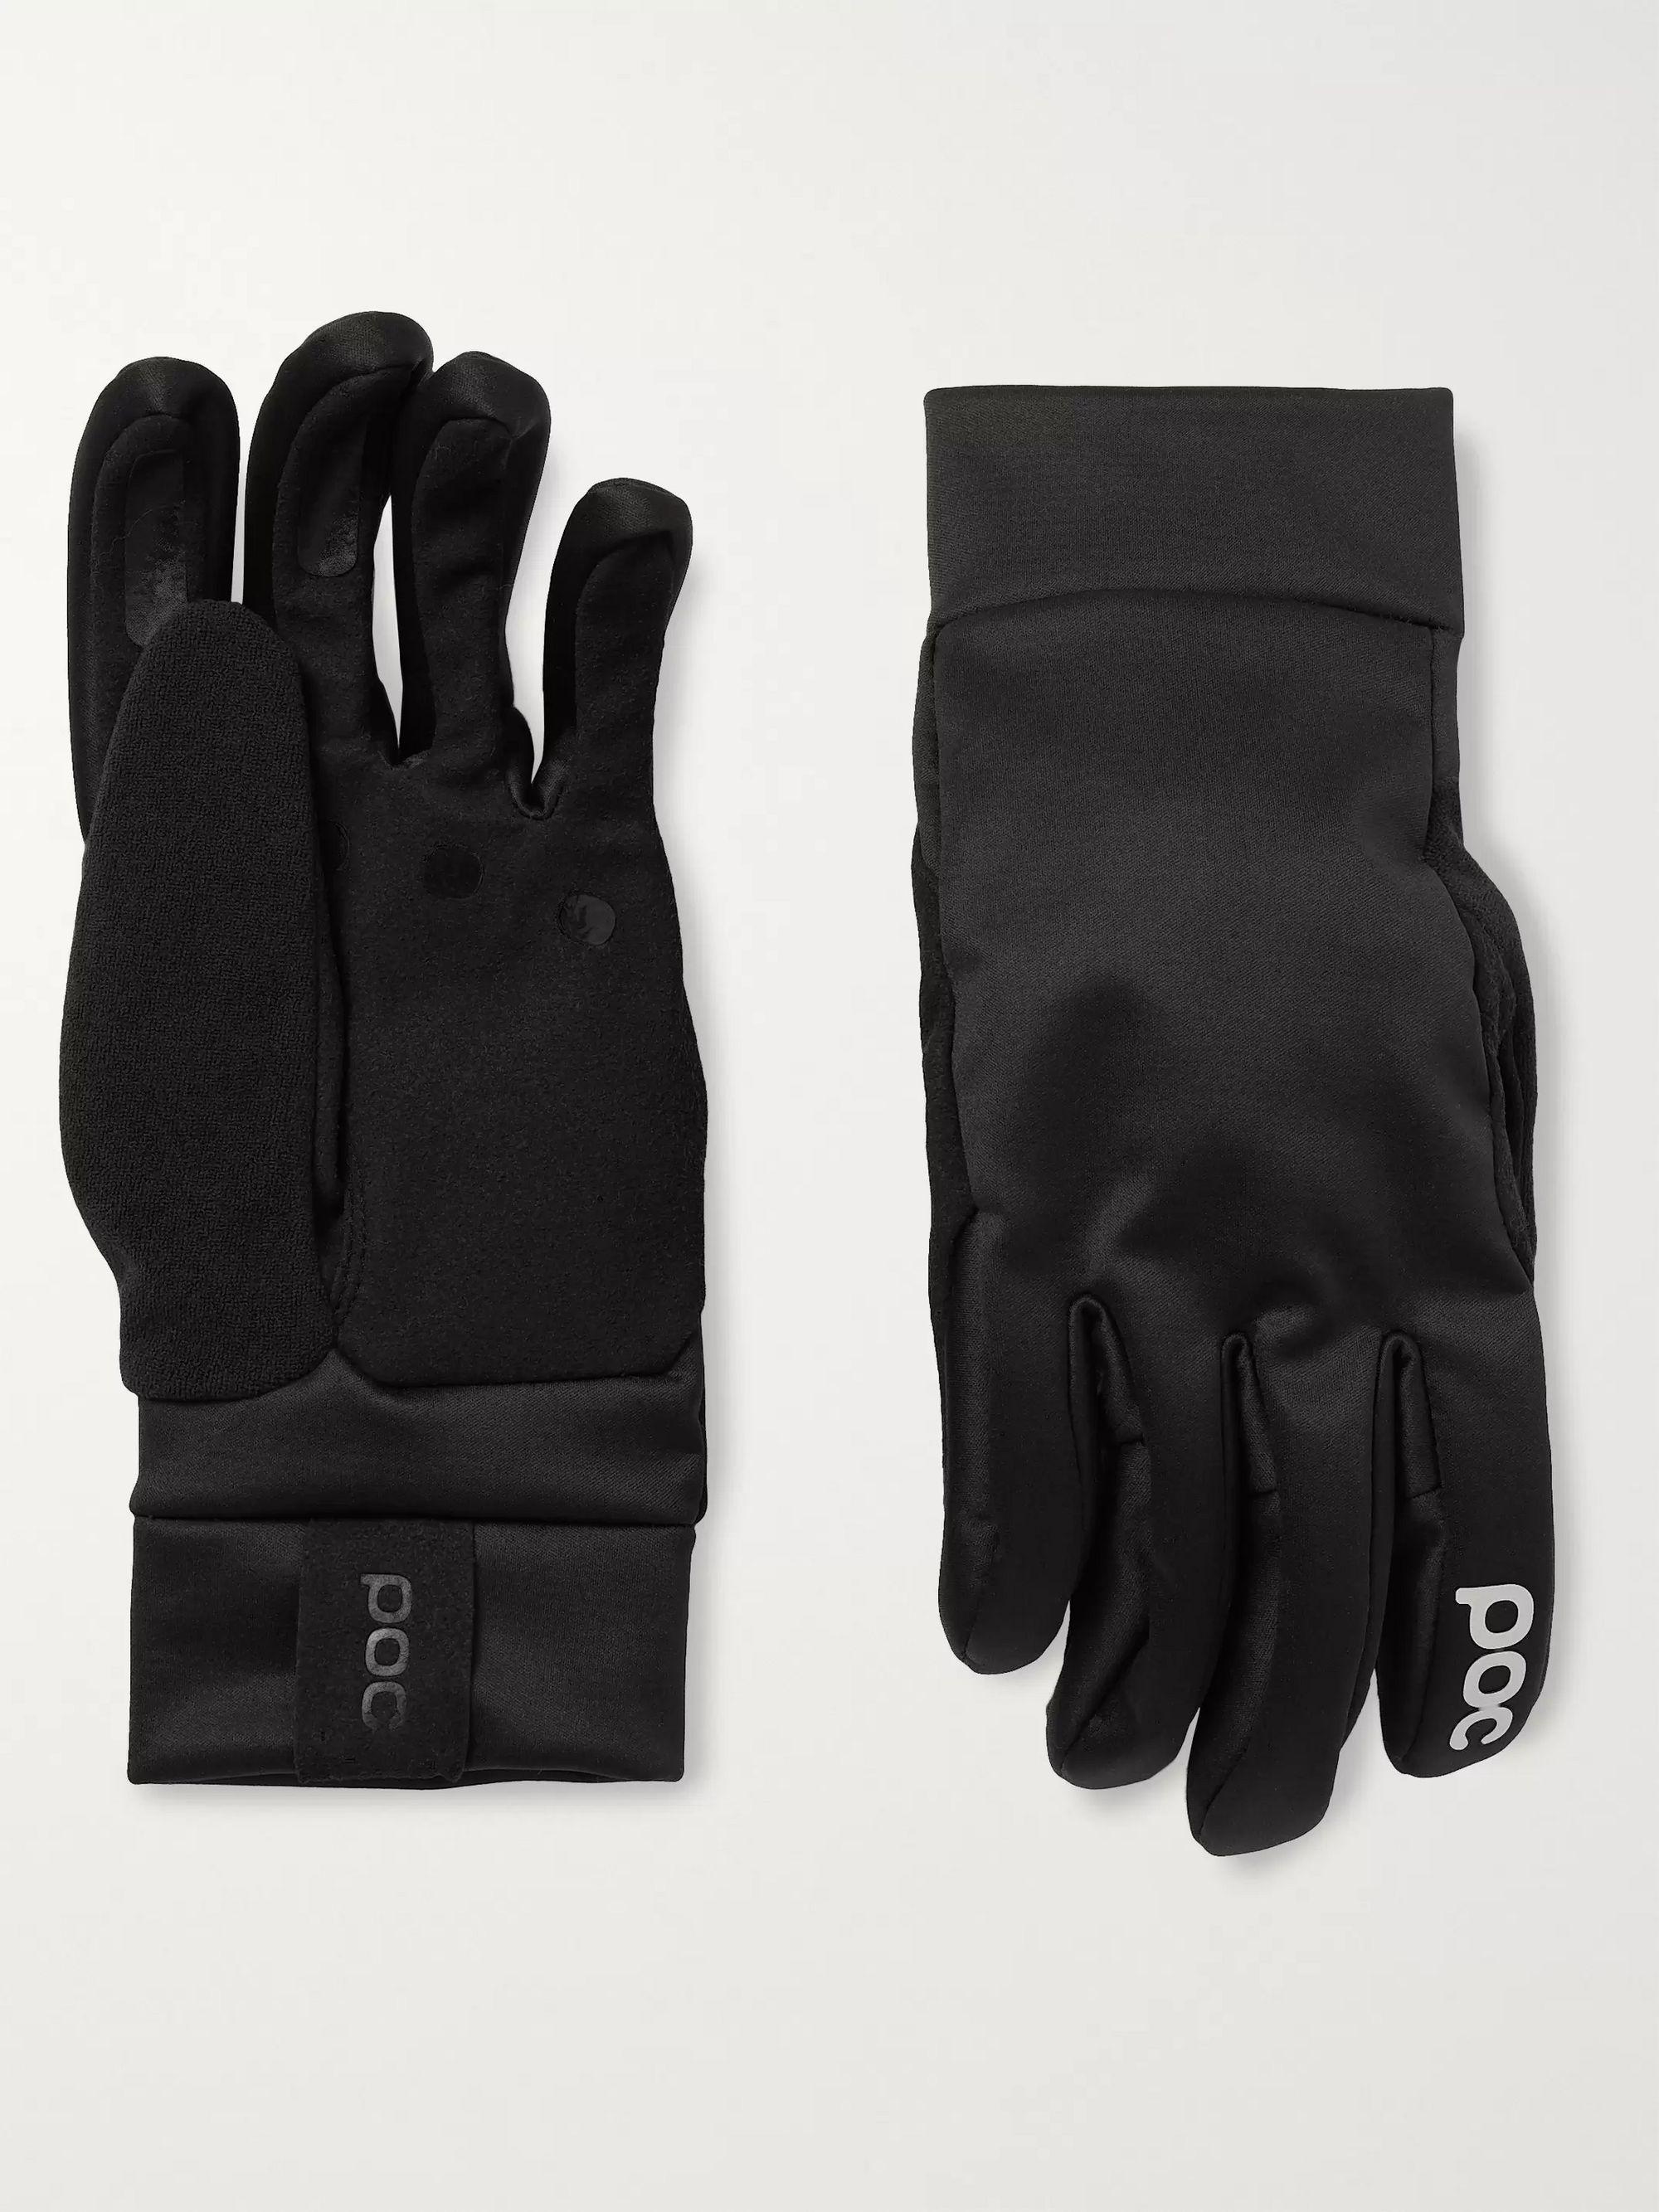 POC Essential Softshell Cycling Gloves